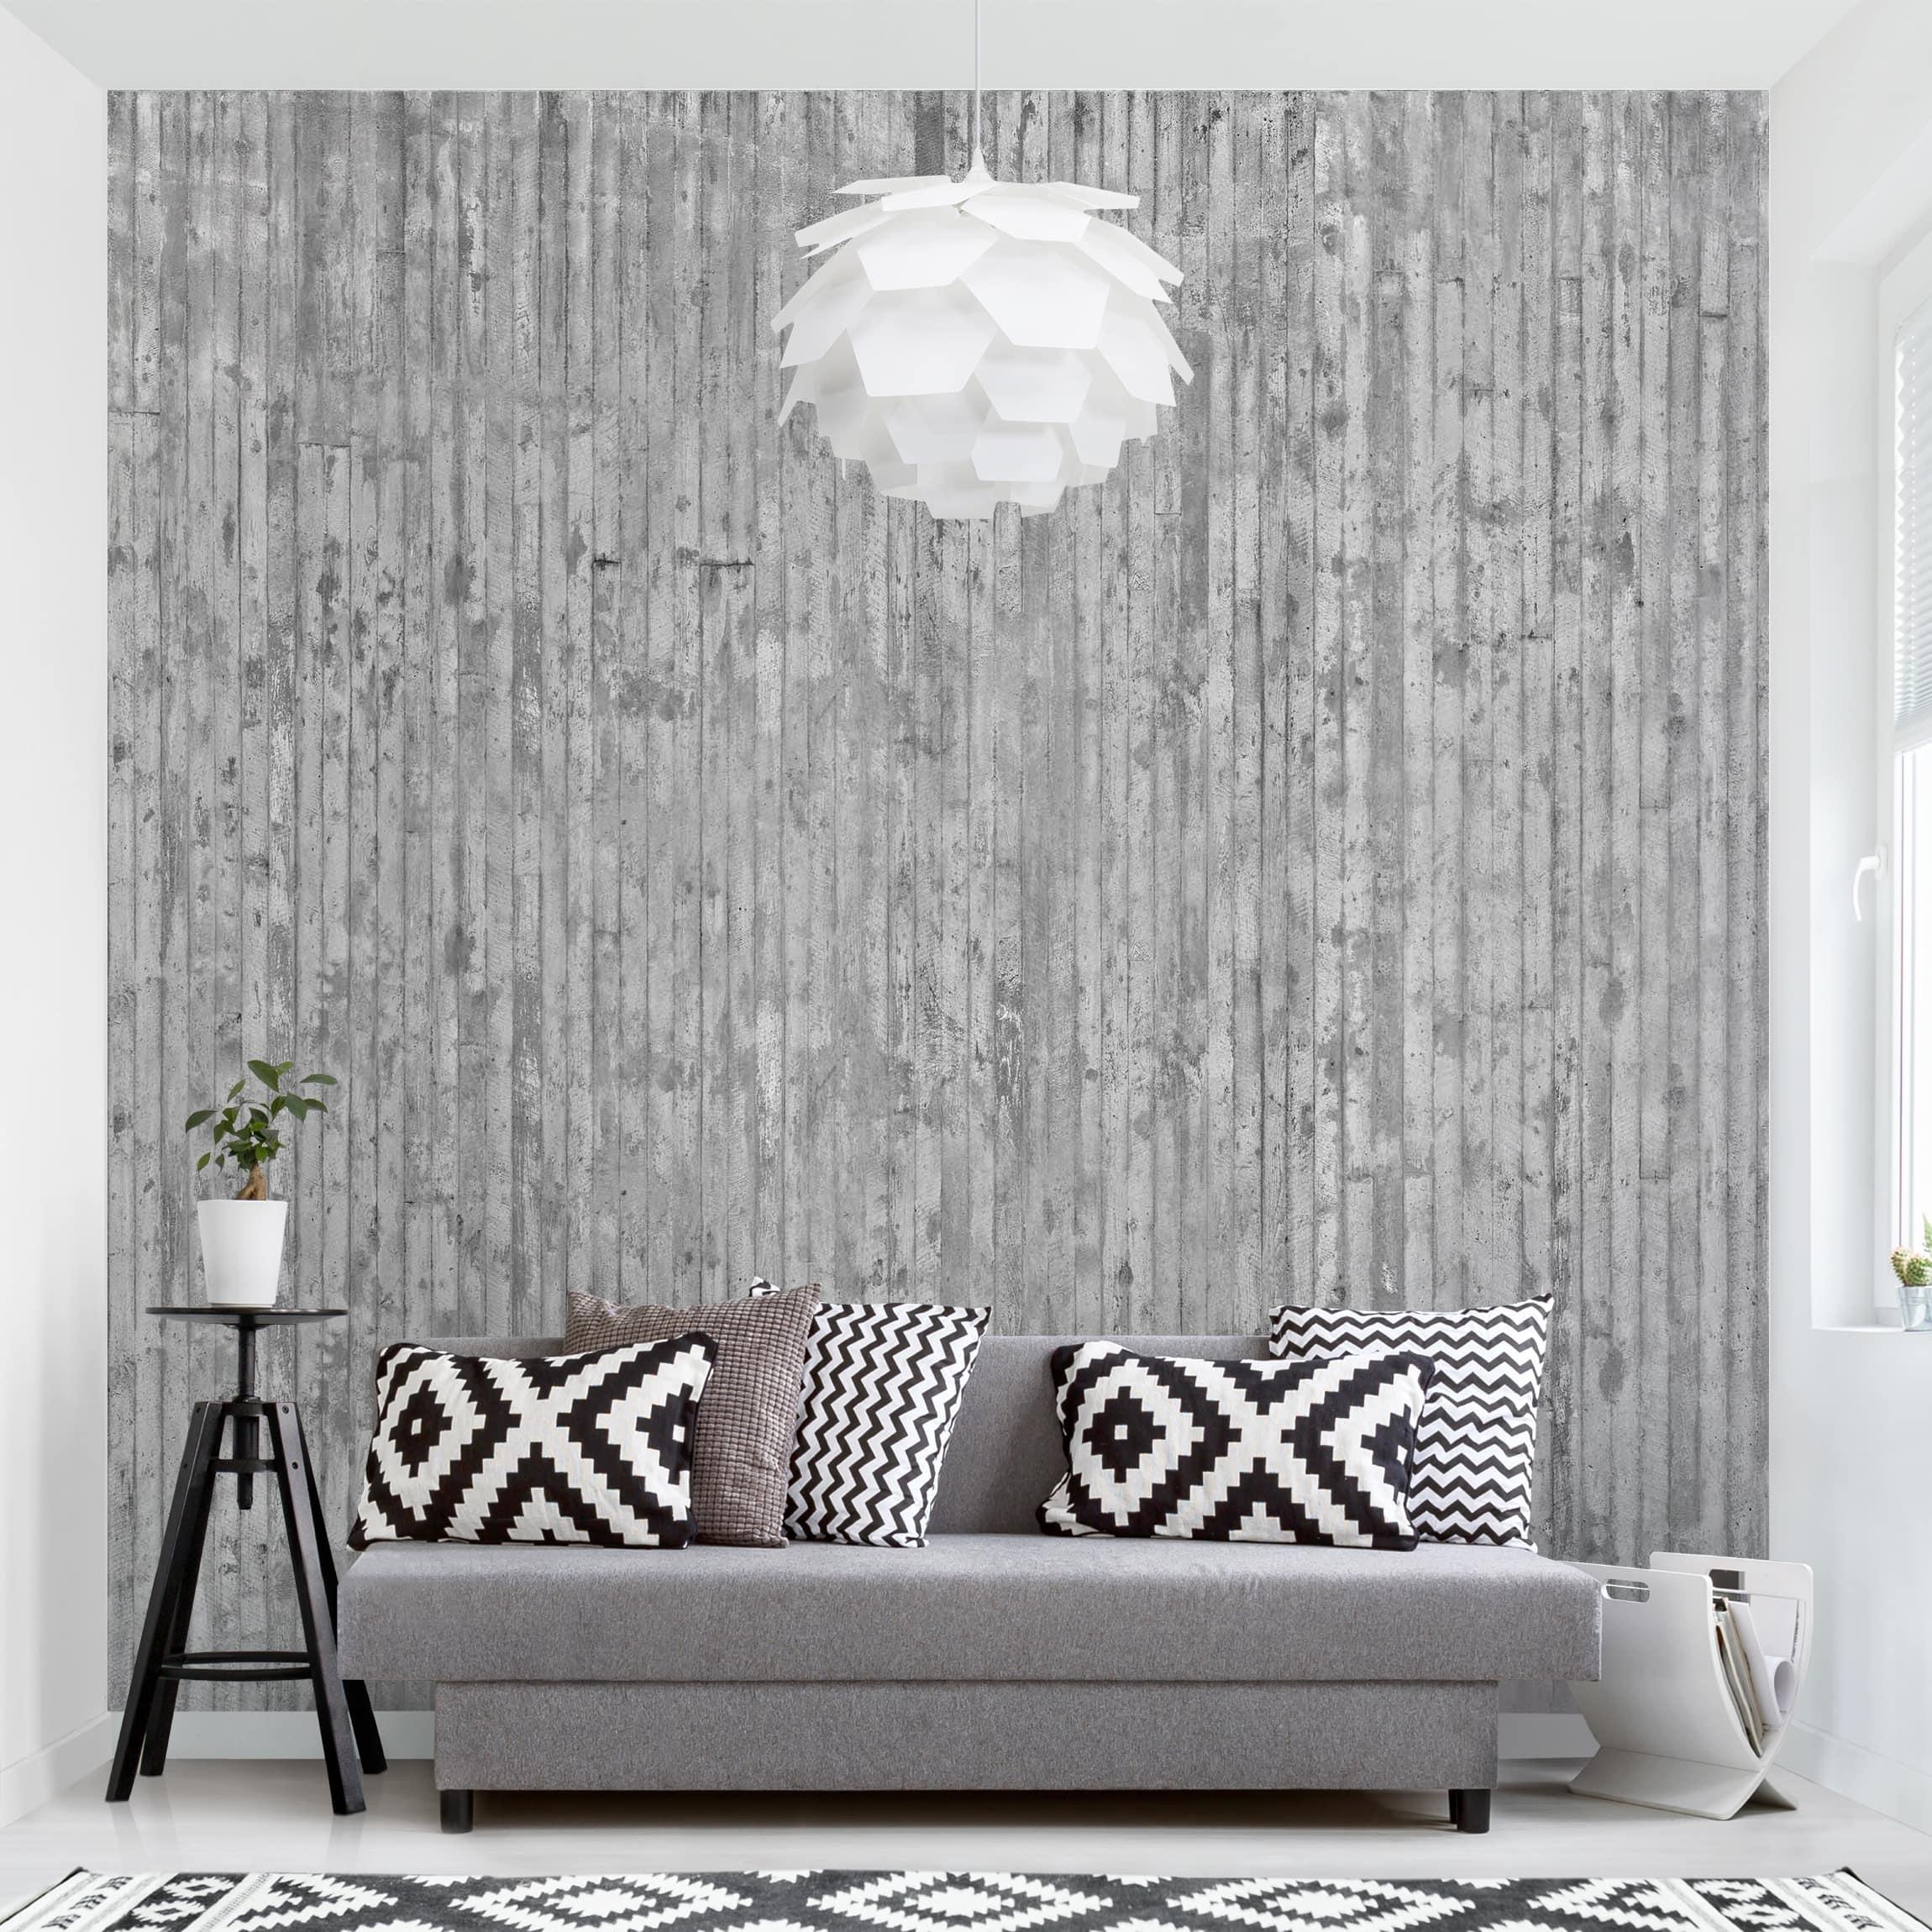 tapete selbstklebend betonoptik tapete mit streifen. Black Bedroom Furniture Sets. Home Design Ideas